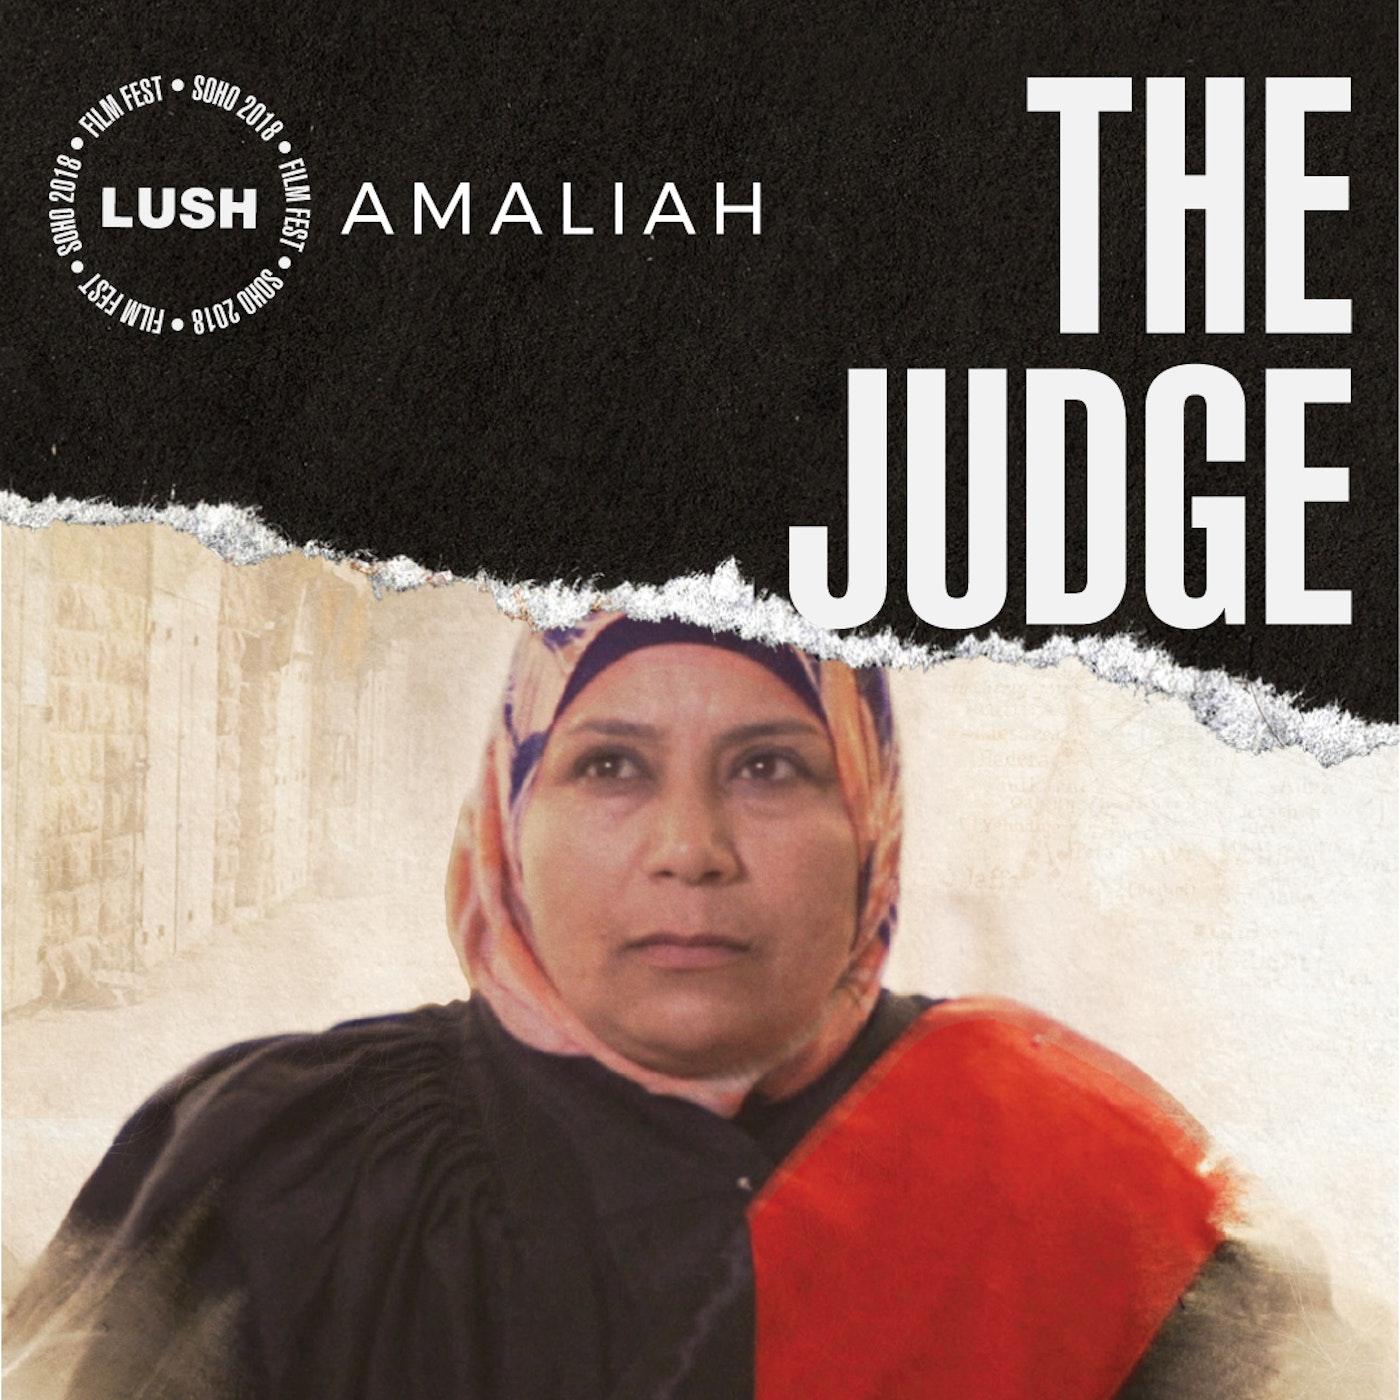 Lush x Amaliah Presents the Judge